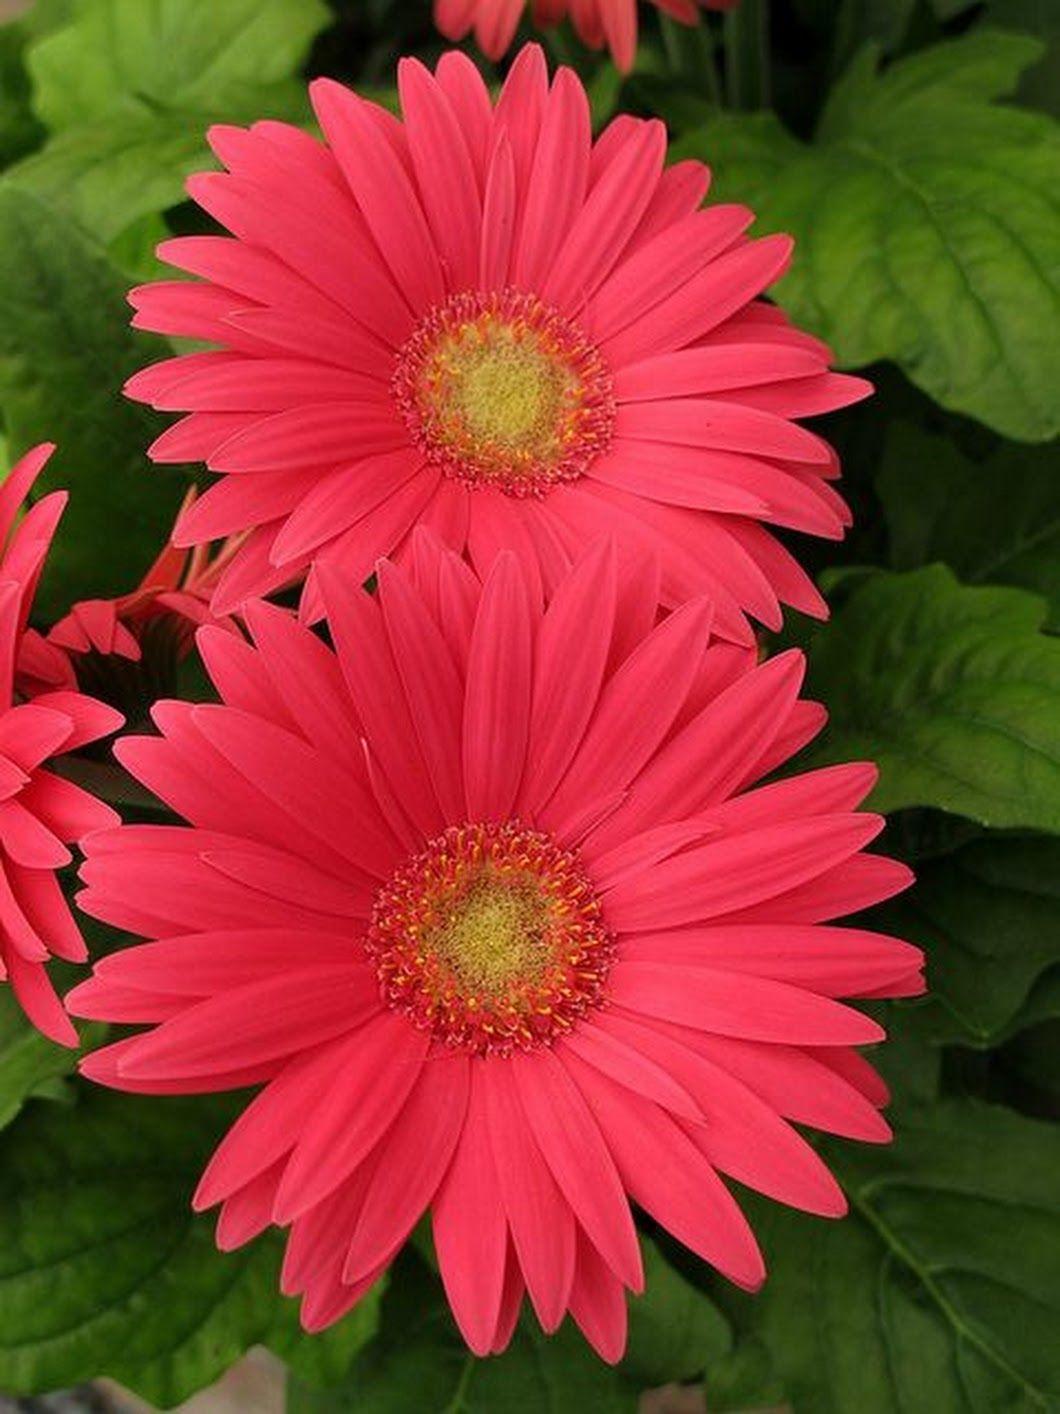 Mara atanasova google flowers and plants pinterest google mara atanasova google izmirmasajfo